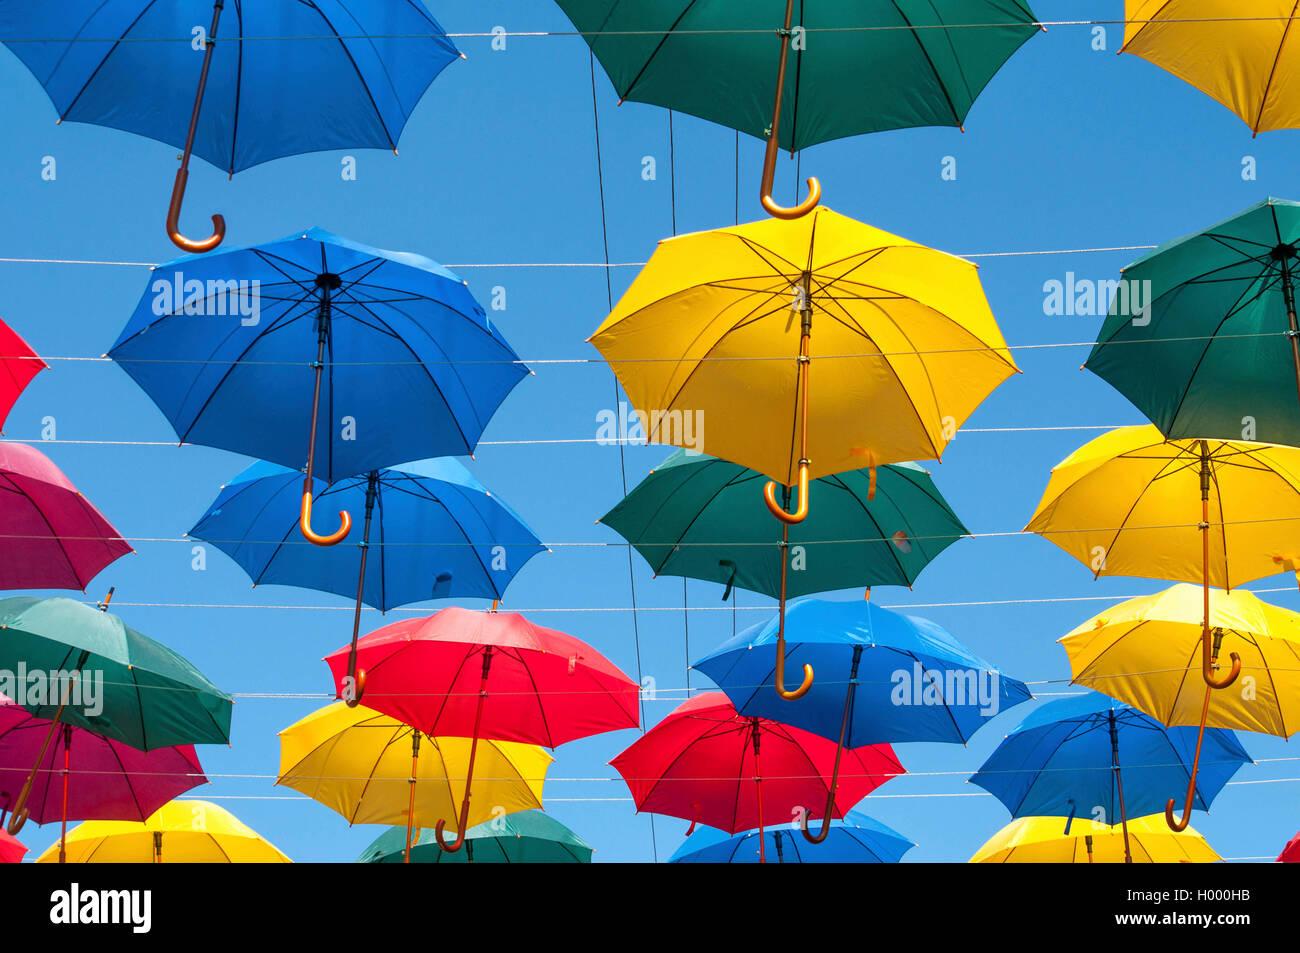 Bright umbrellas in the street - Stock Image